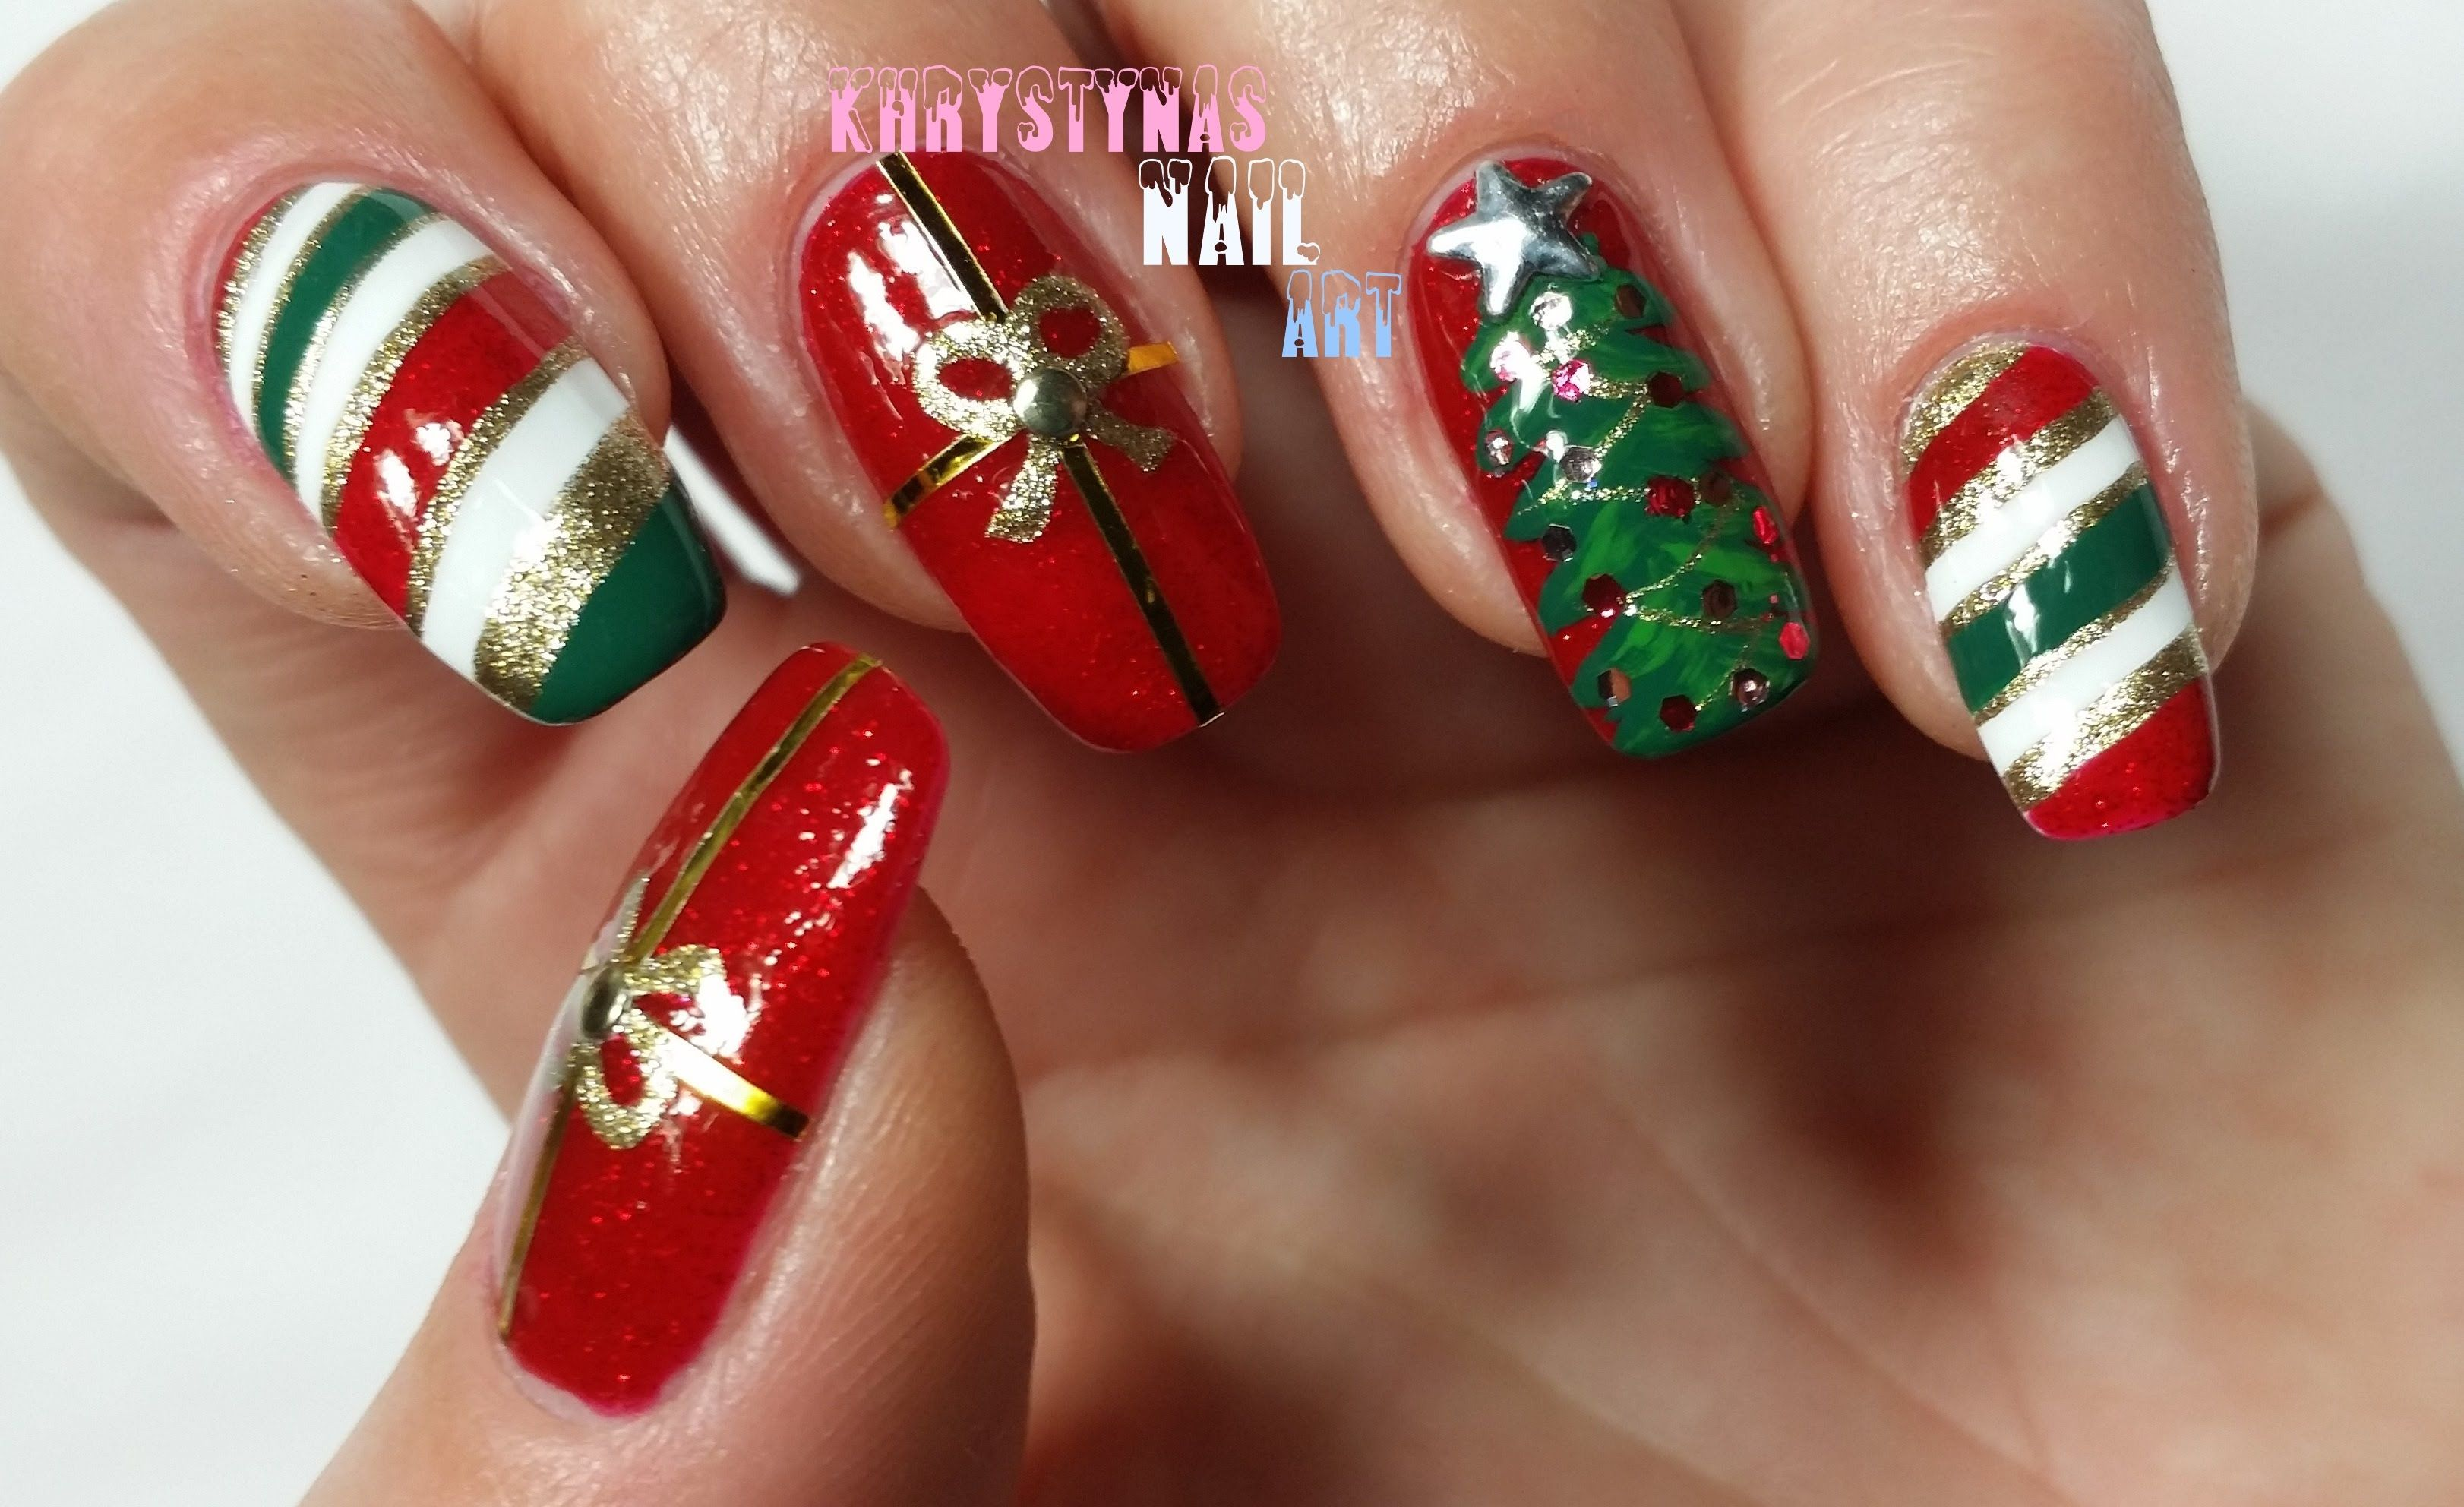 Nail Art for Christmas Three Christmas Nail Art Designs for